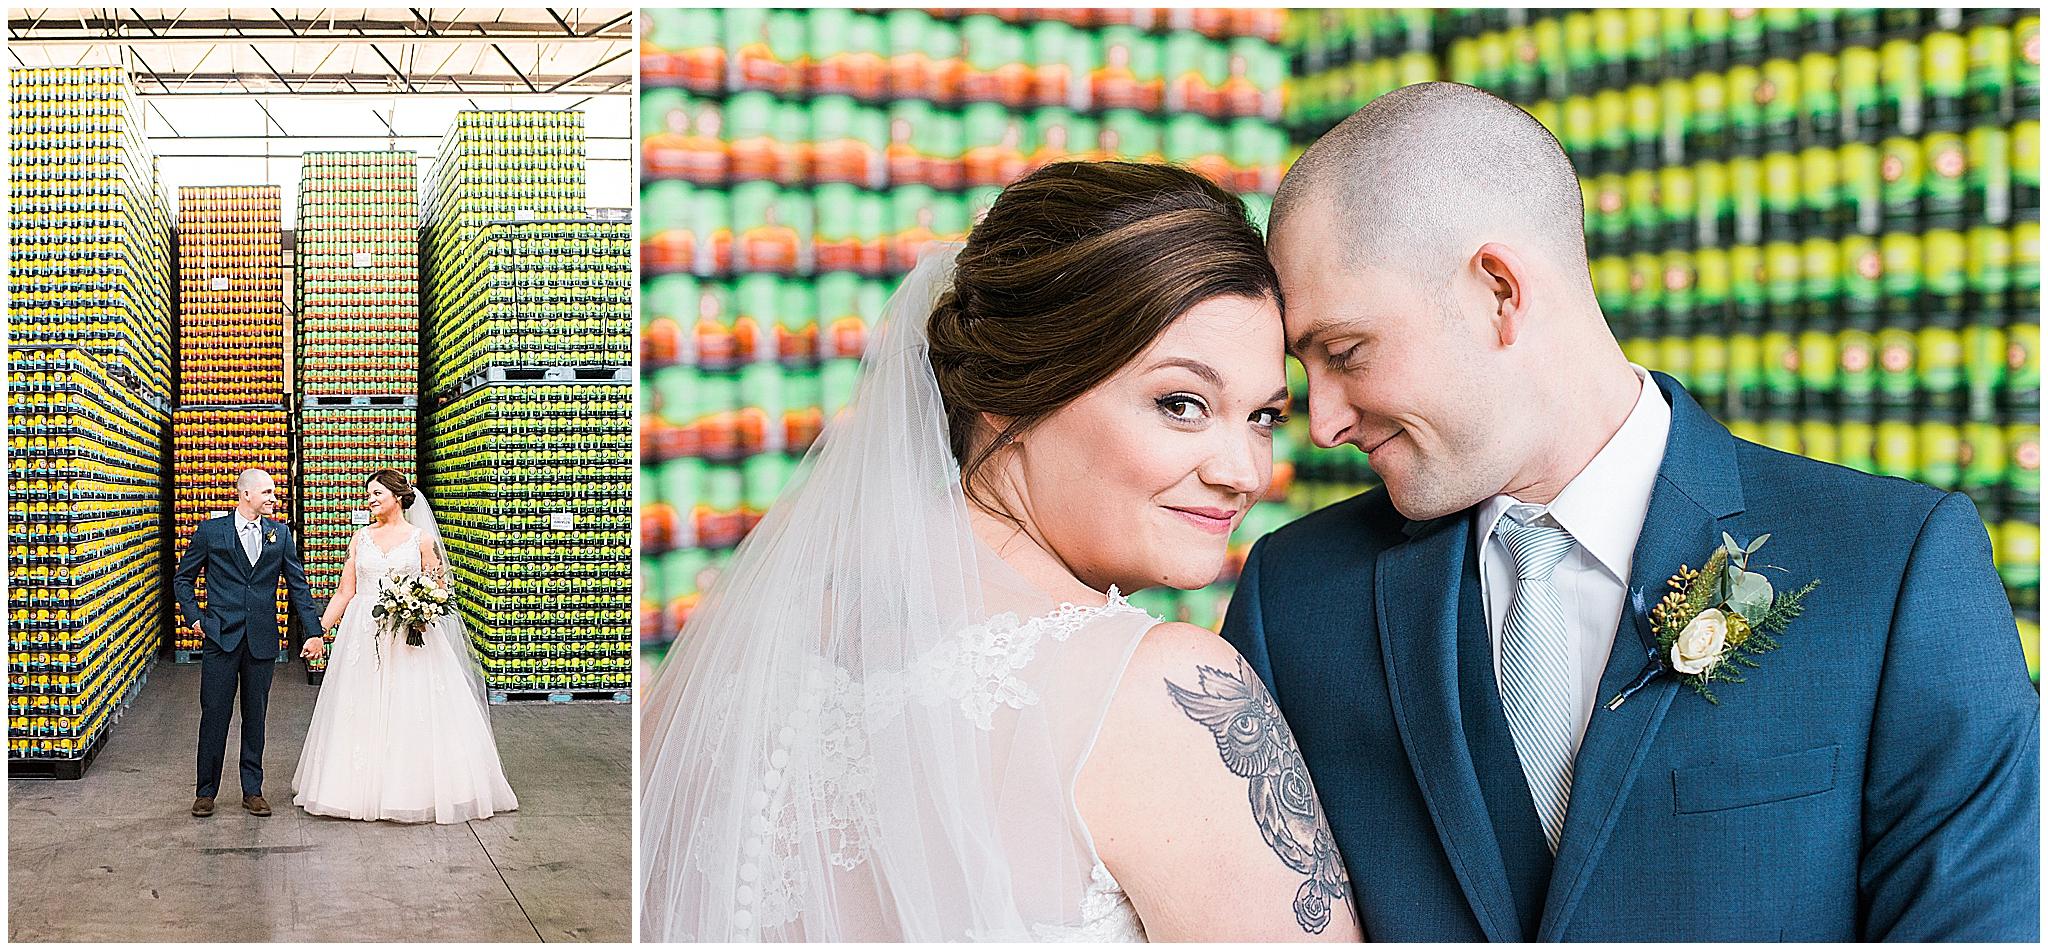 Wedding_Photographer_Asheville_Highland_Brewing_0014.jpg